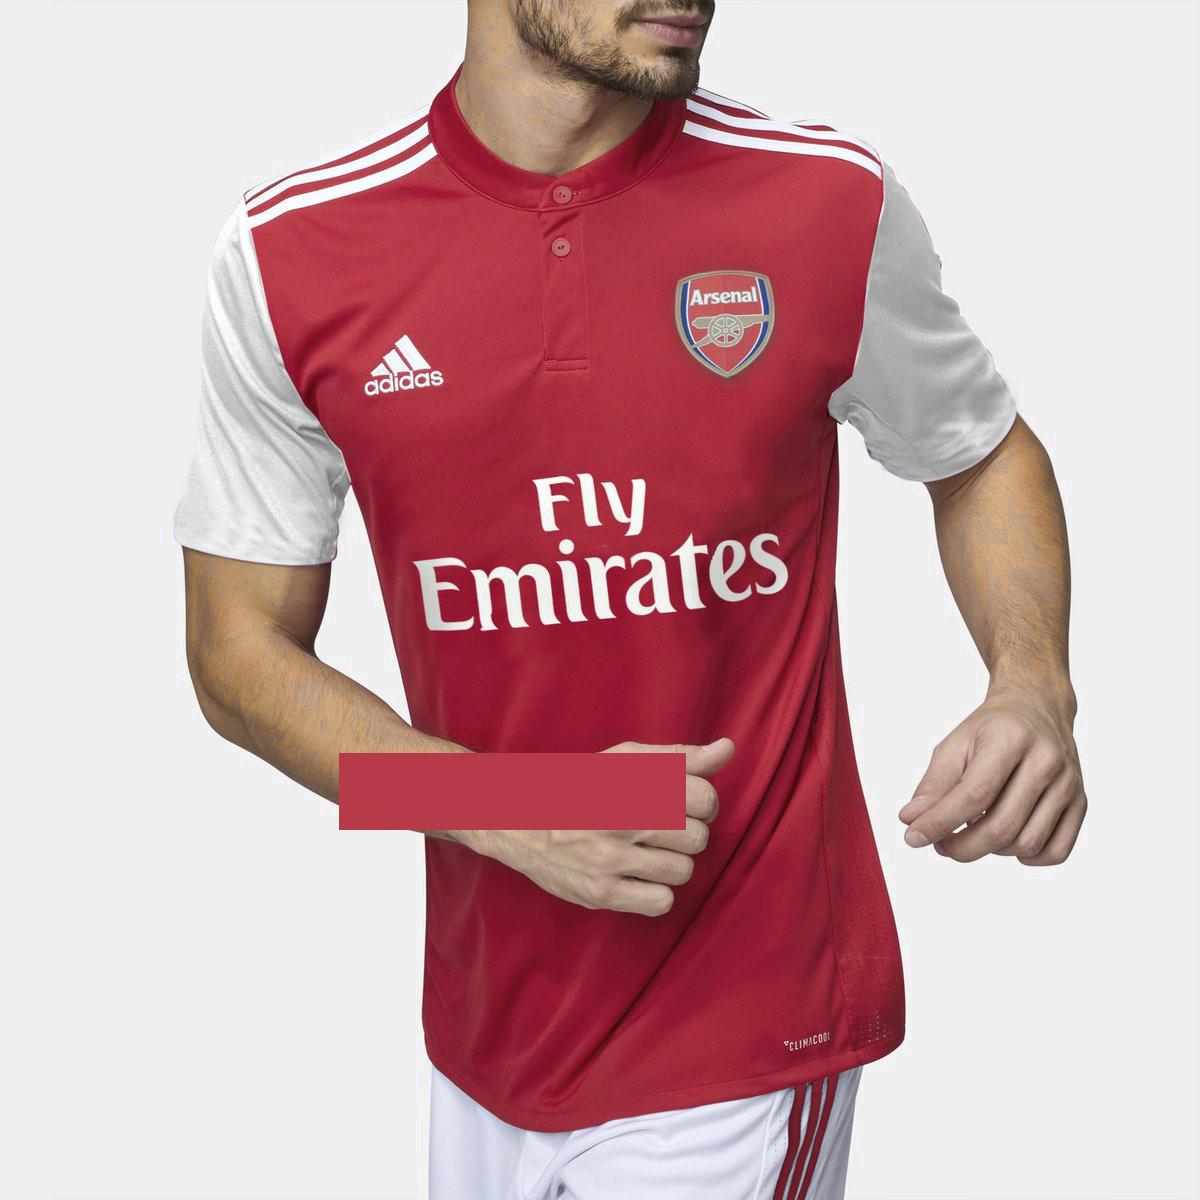 Arsenal 2020 possible maillot domicile